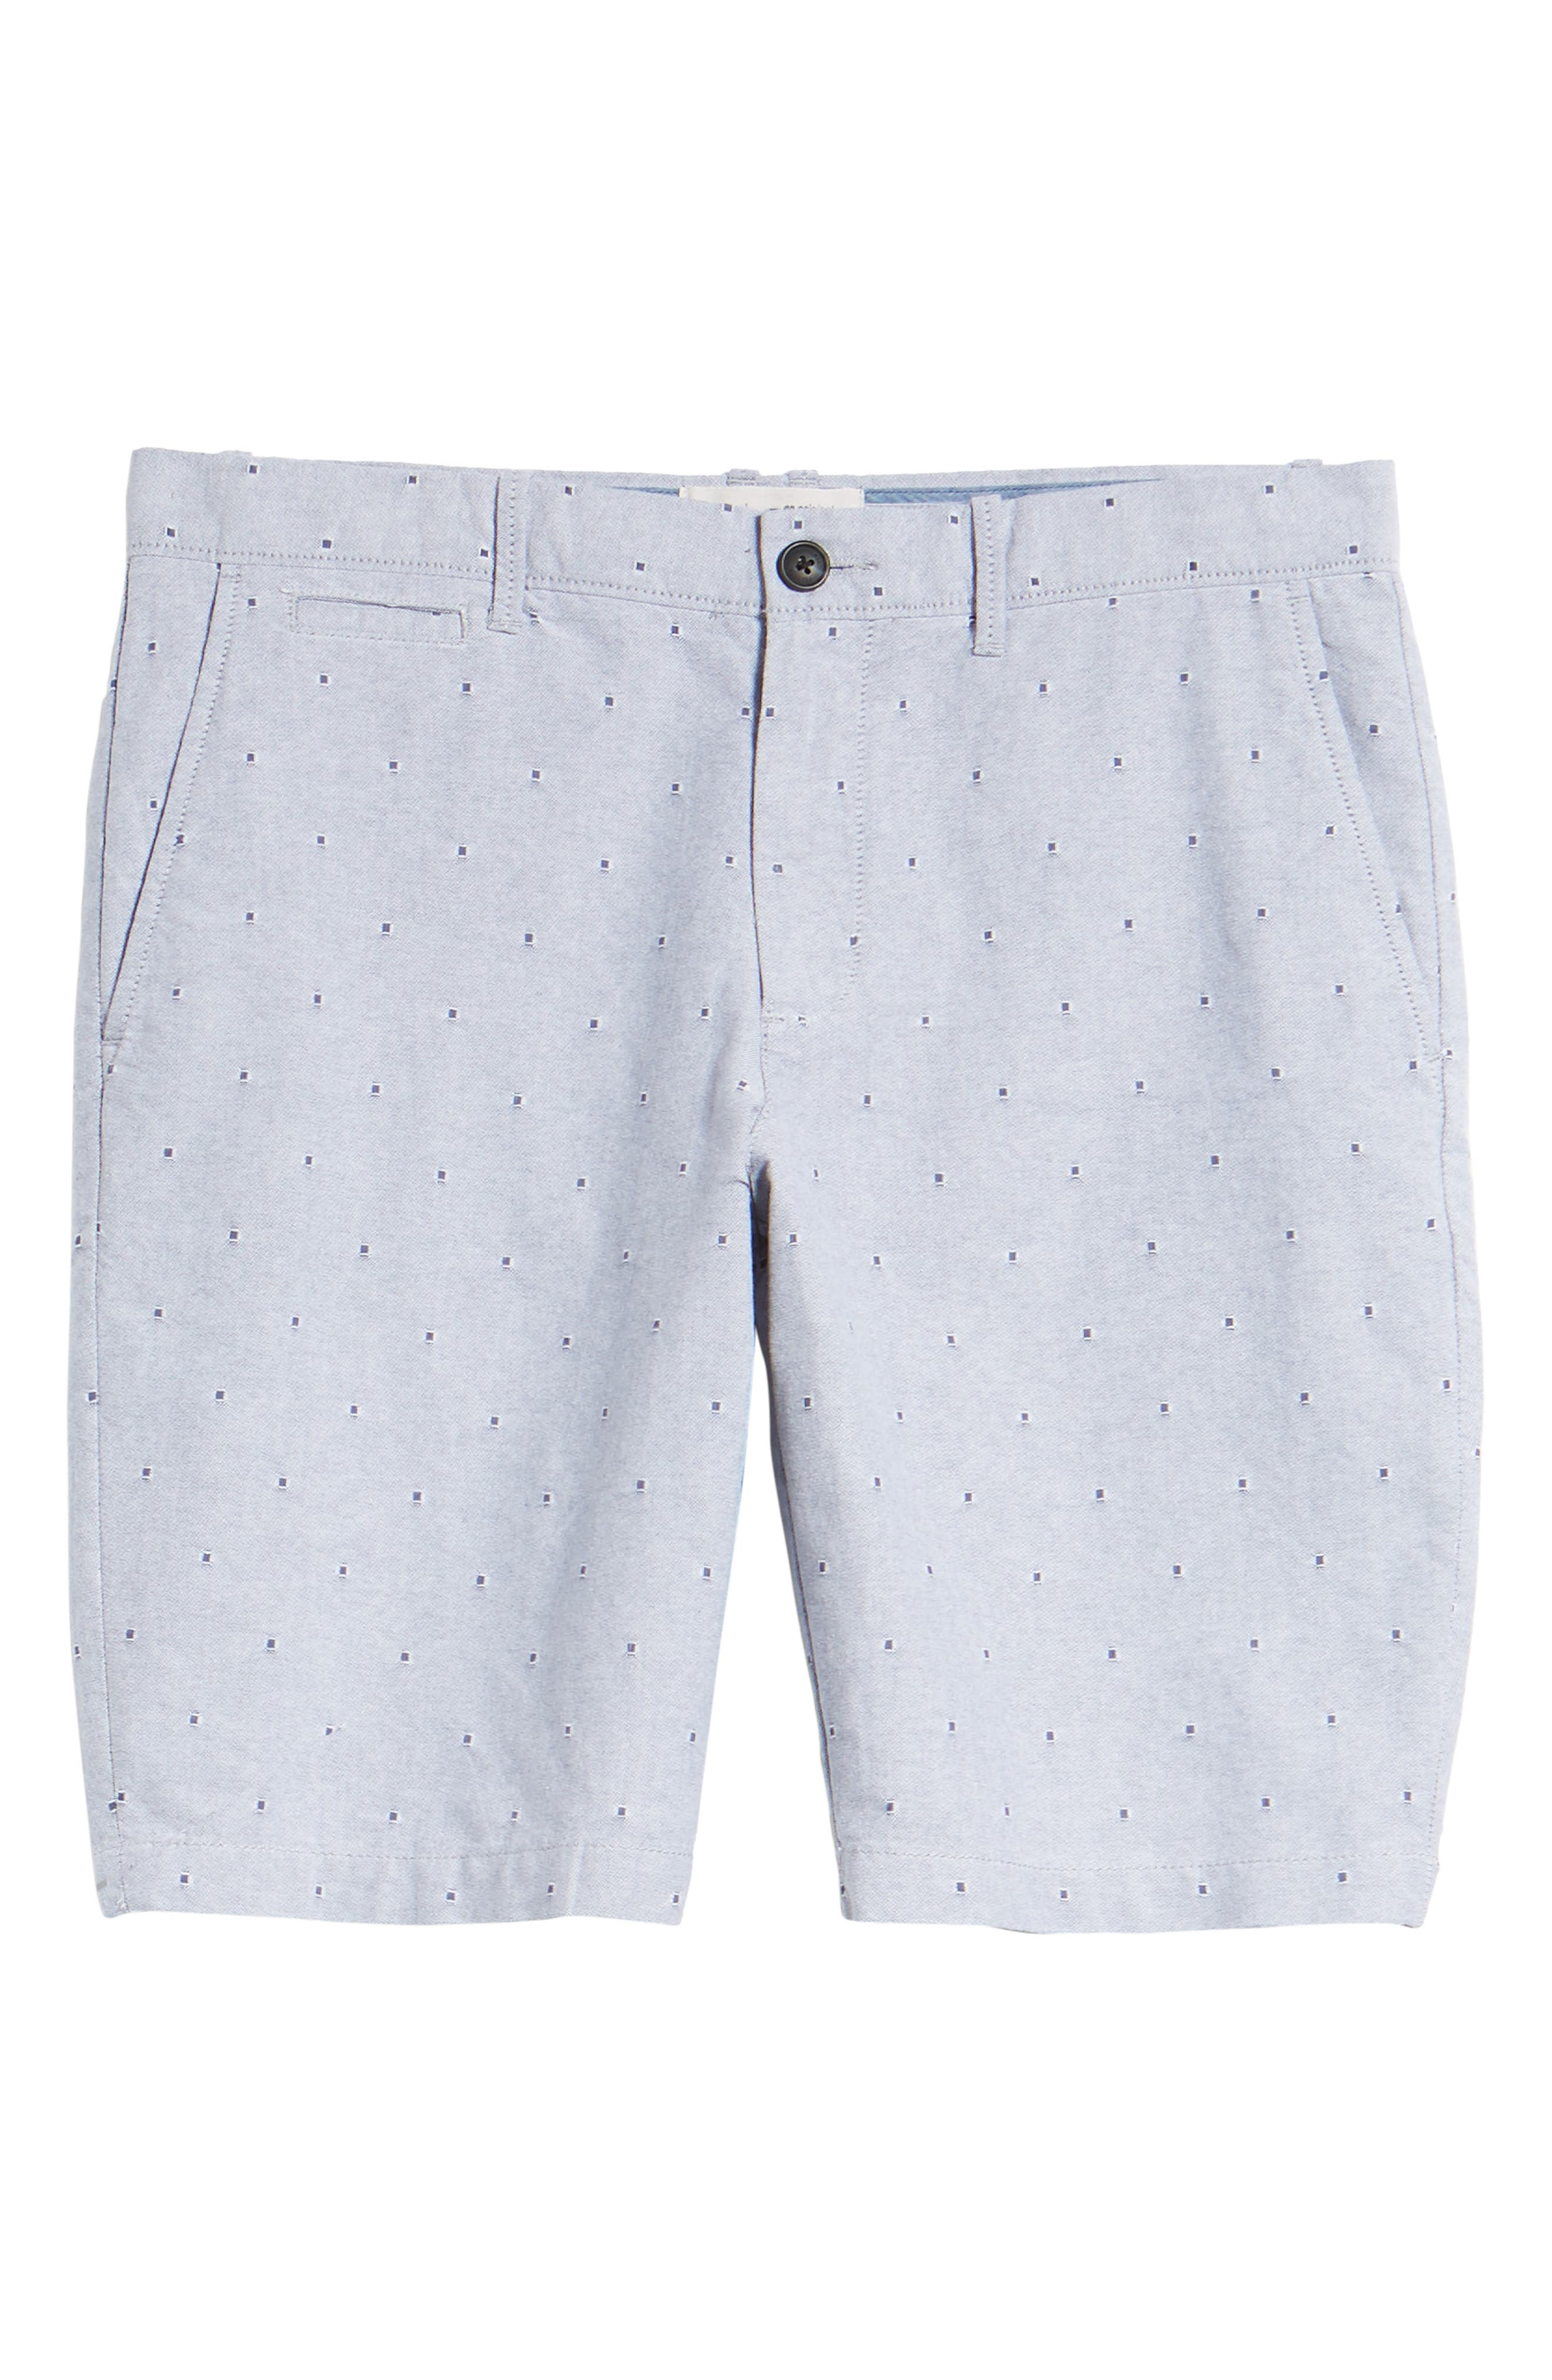 Dobby Dot Slim Fit Oxford Shorts,                             Alternate thumbnail 8, color,